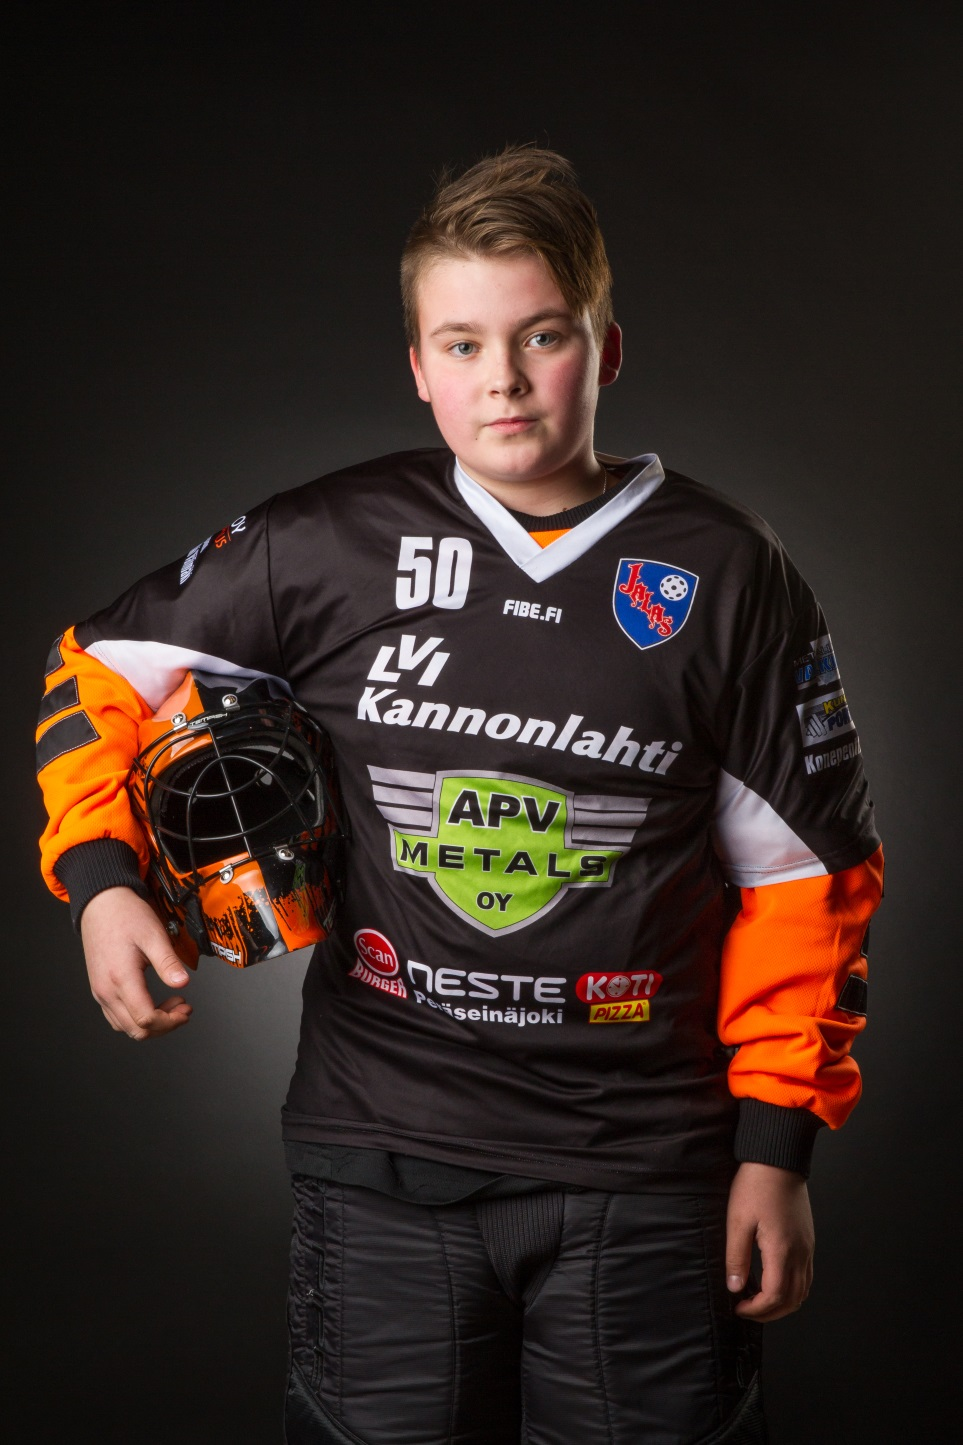 #50 Kasper Ketola